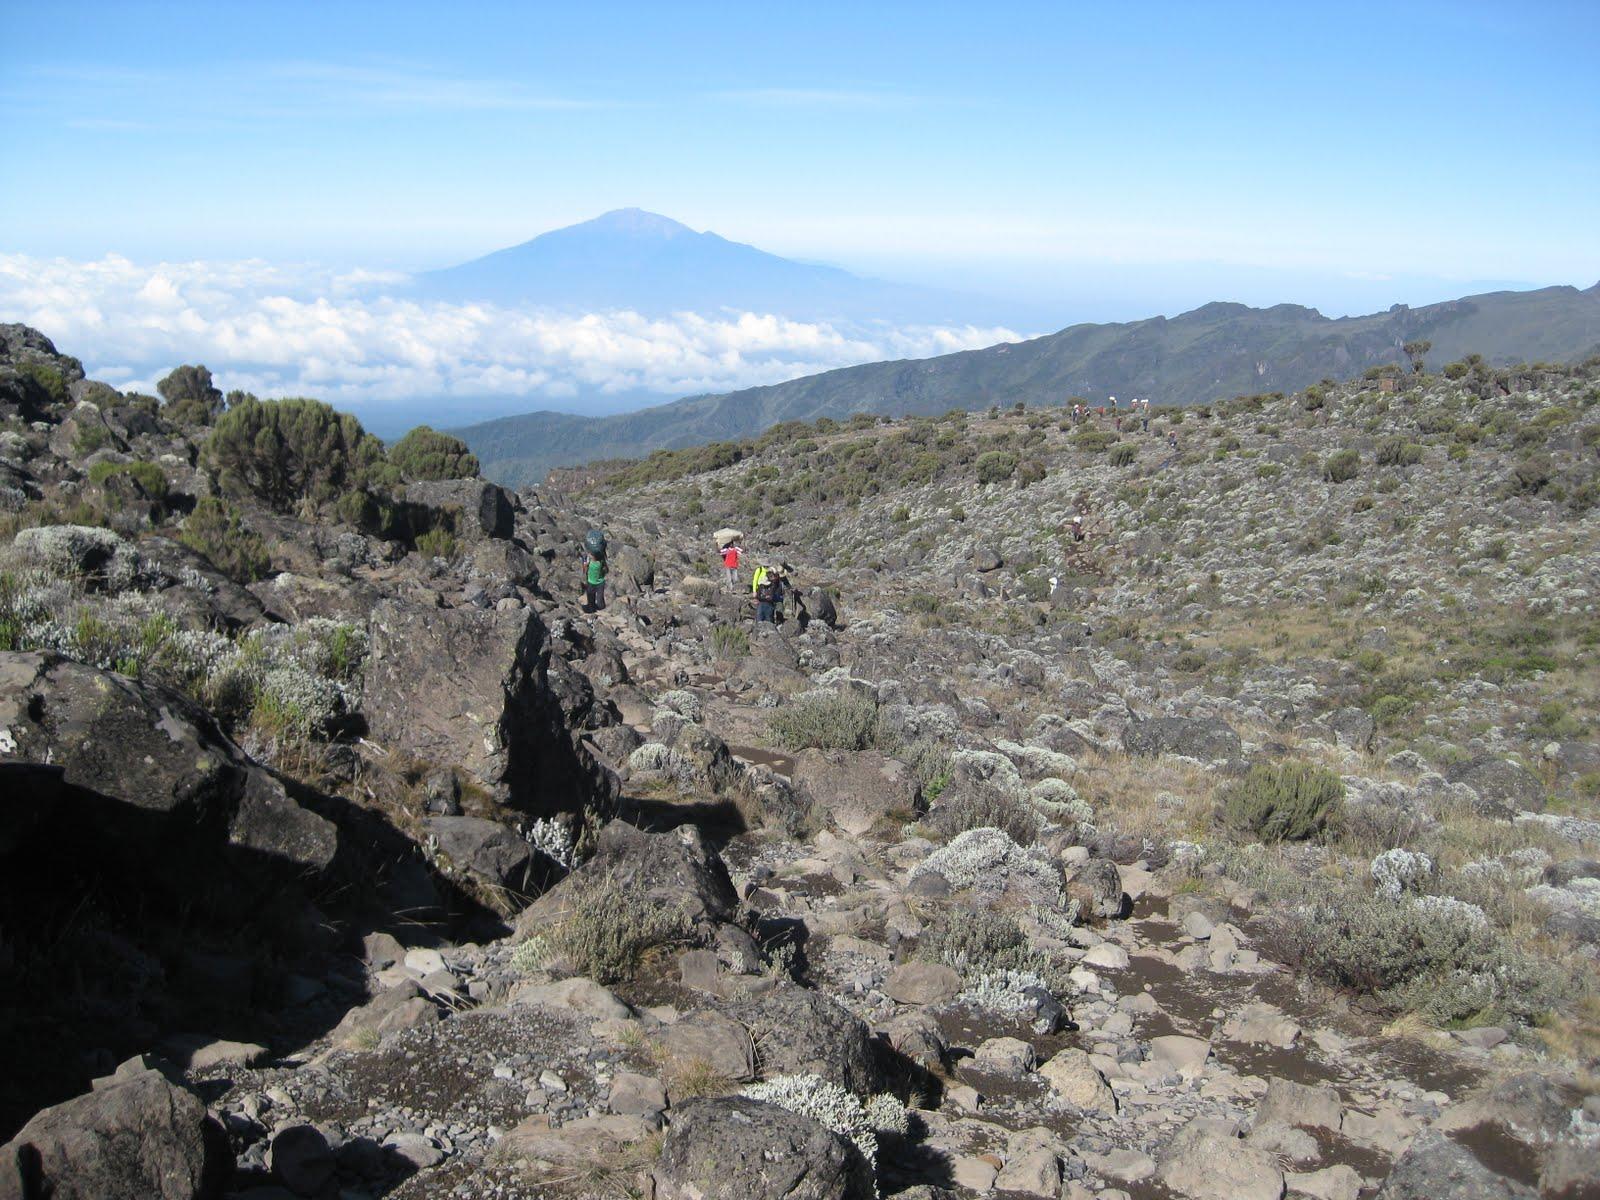 /wp-content/uploads/itineraries/Kilimanjaro/kili-machame-day3.jpg